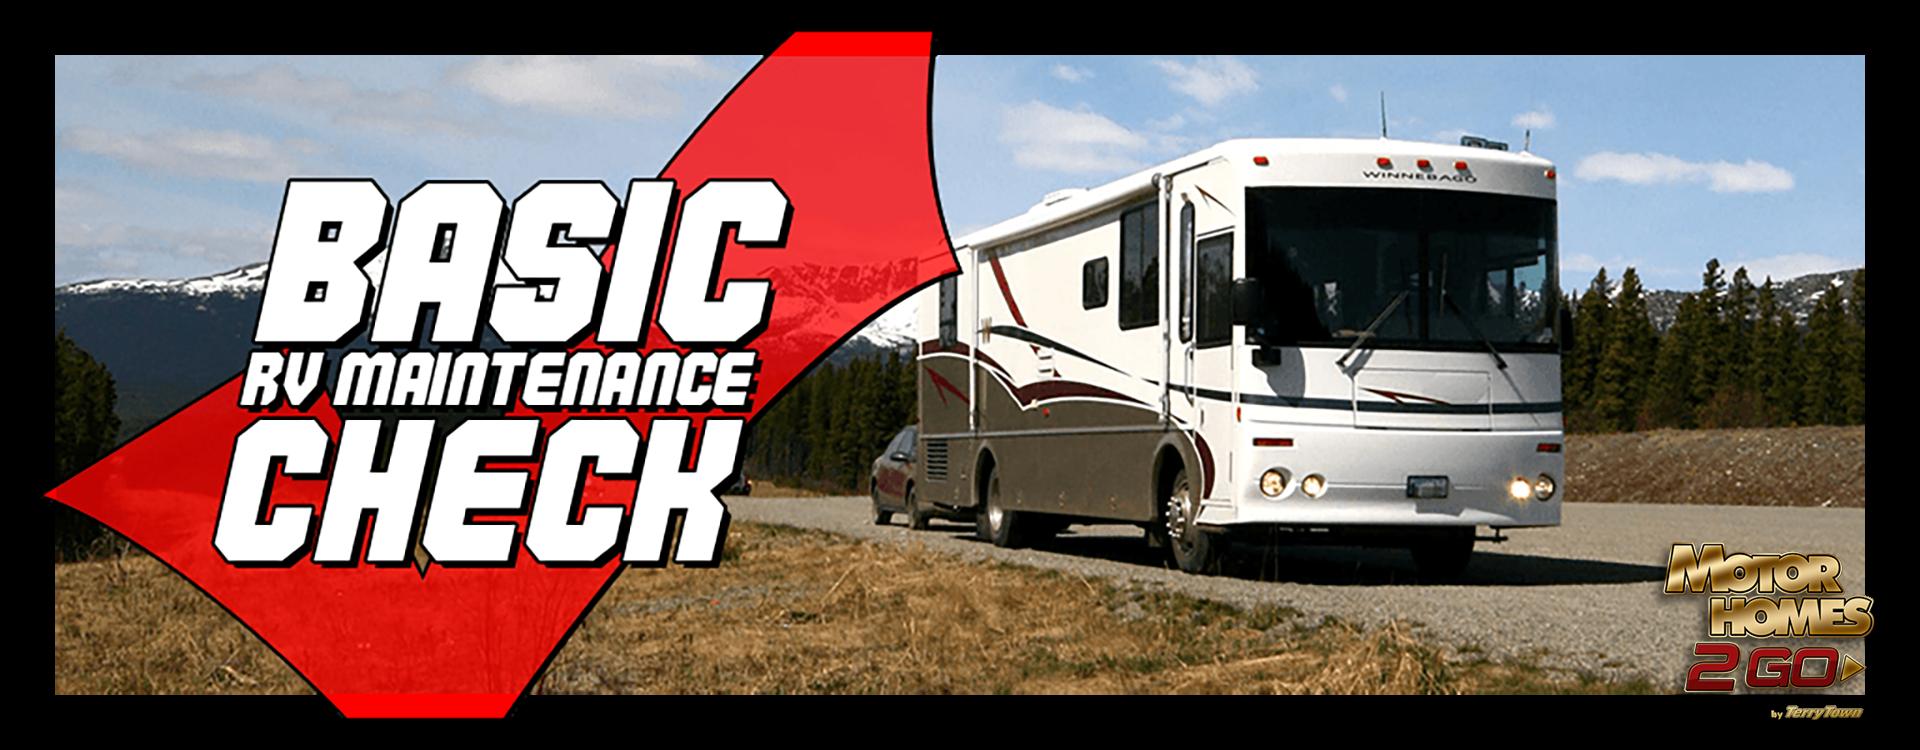 Basic RV maintenance check Banner